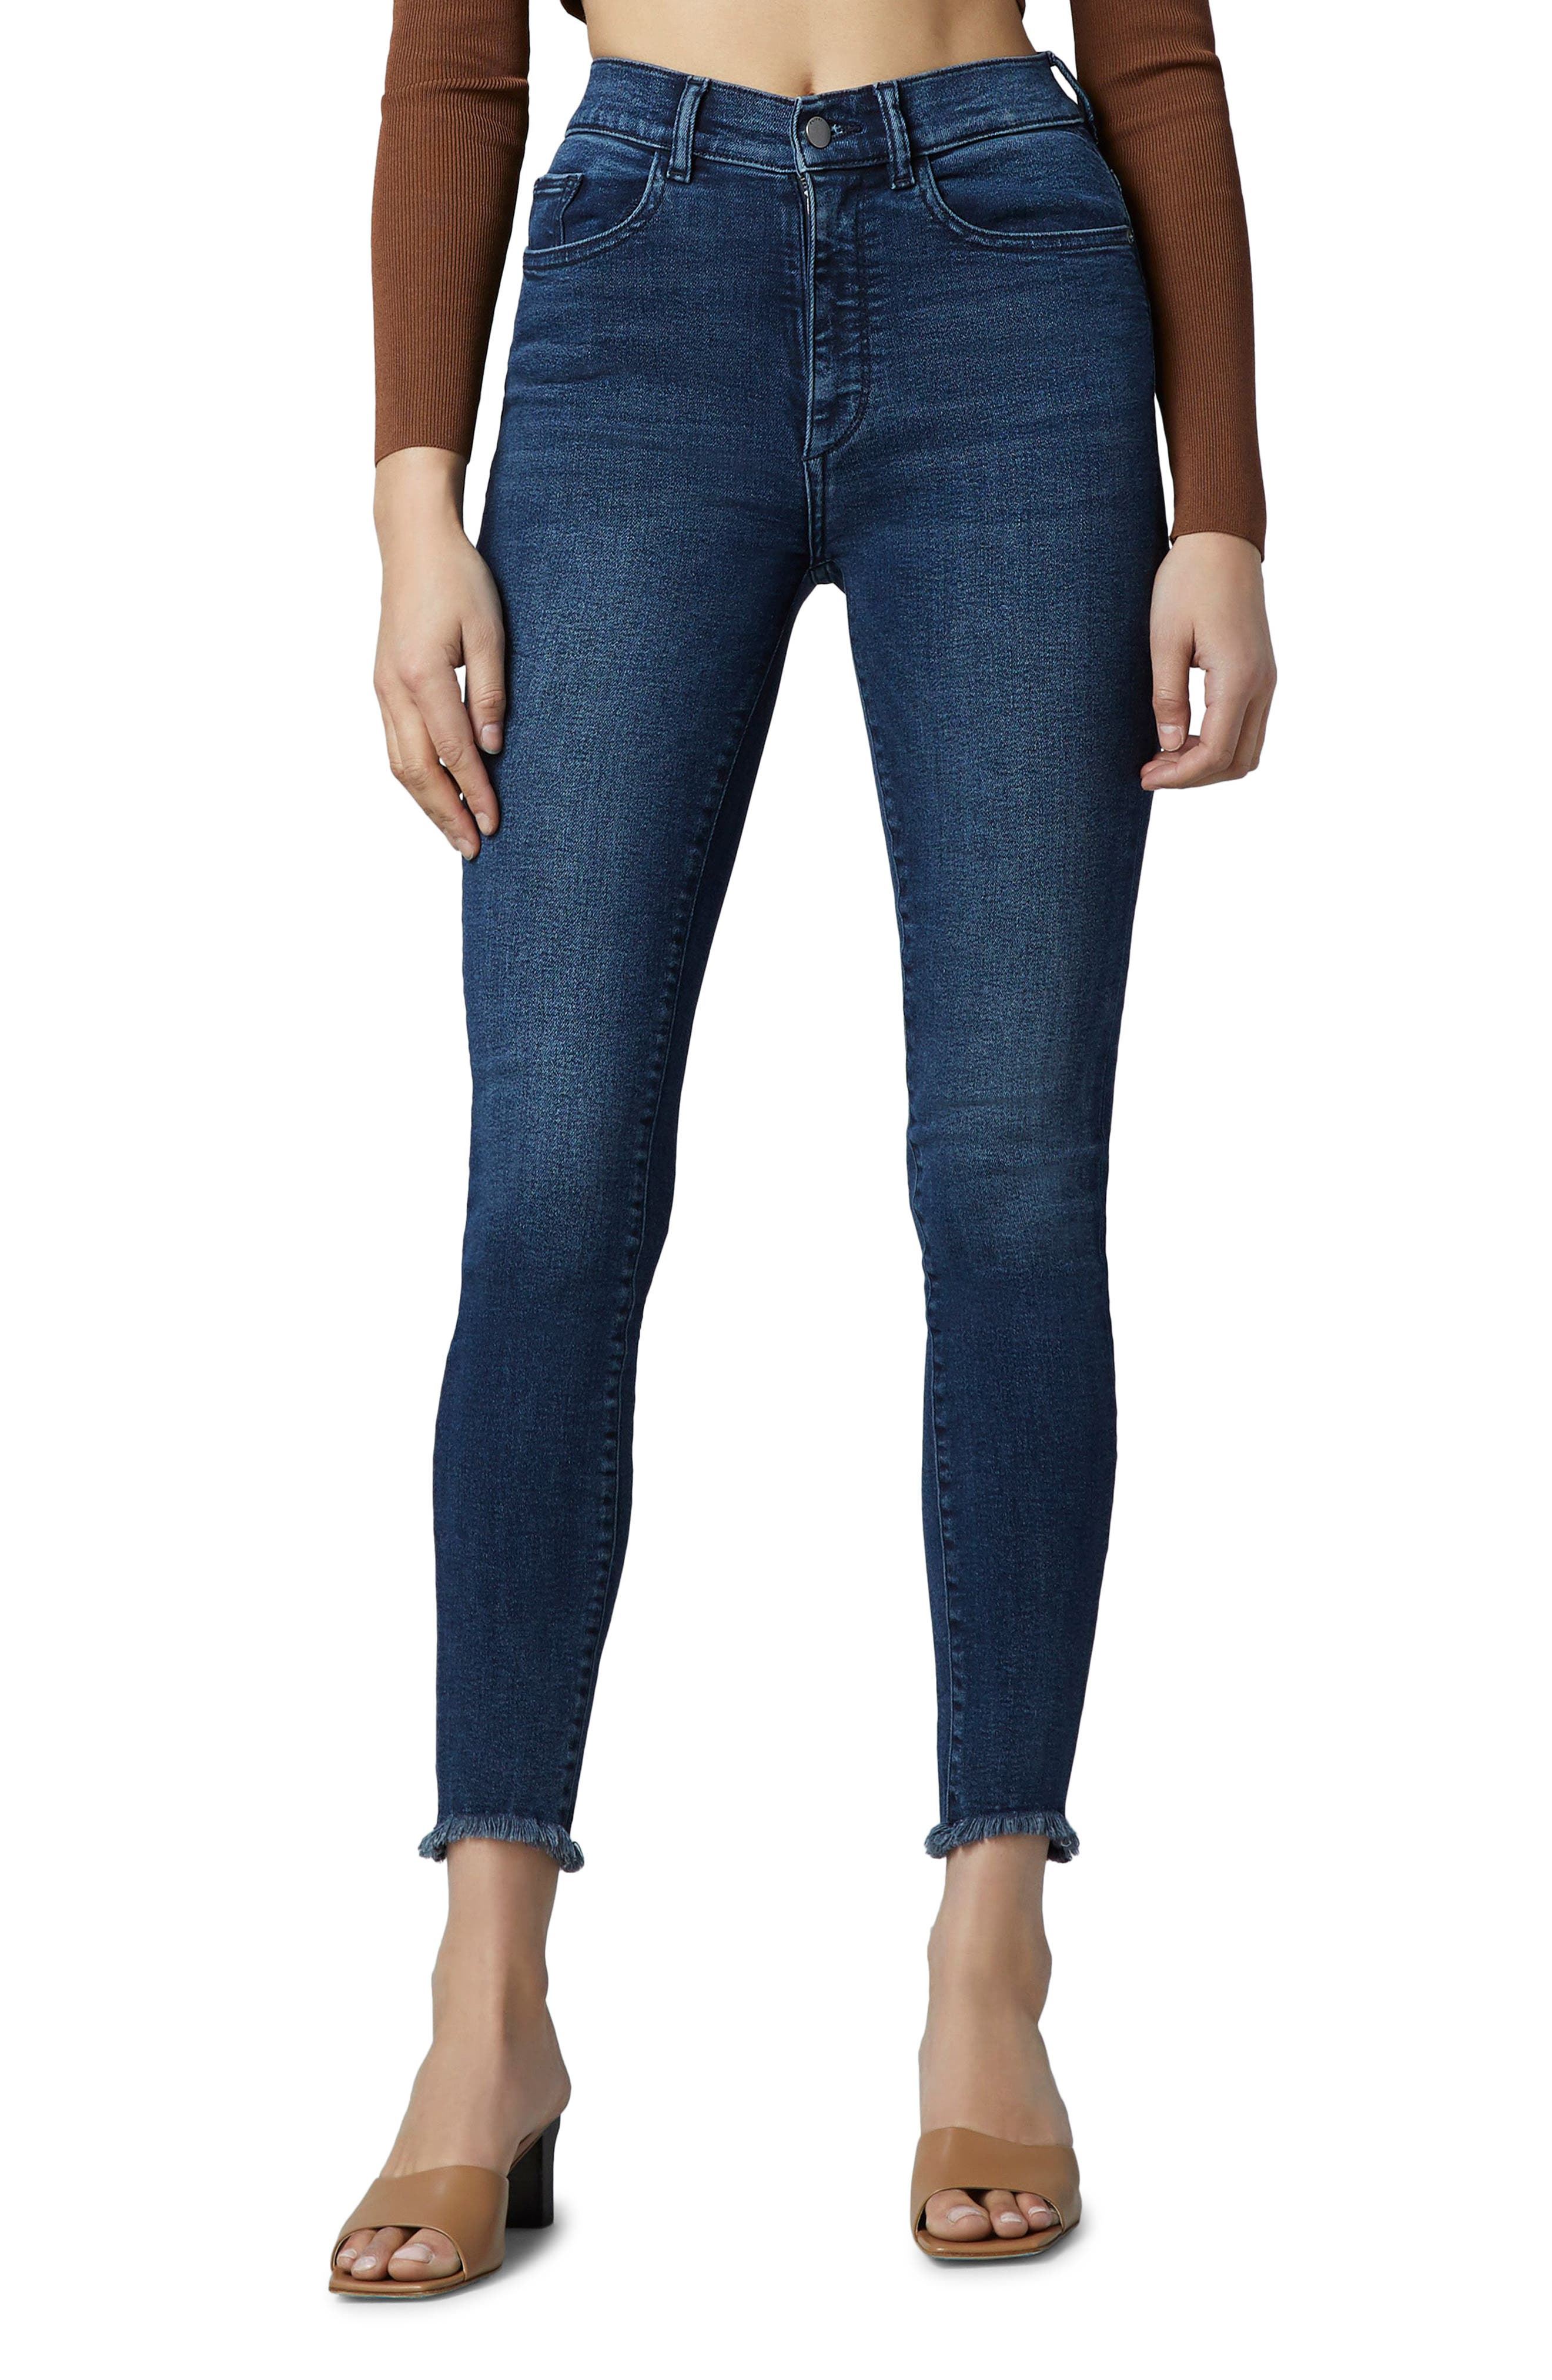 1961 Farrow Instasculpt Frayed High Waist Ankle Skinny Jeans